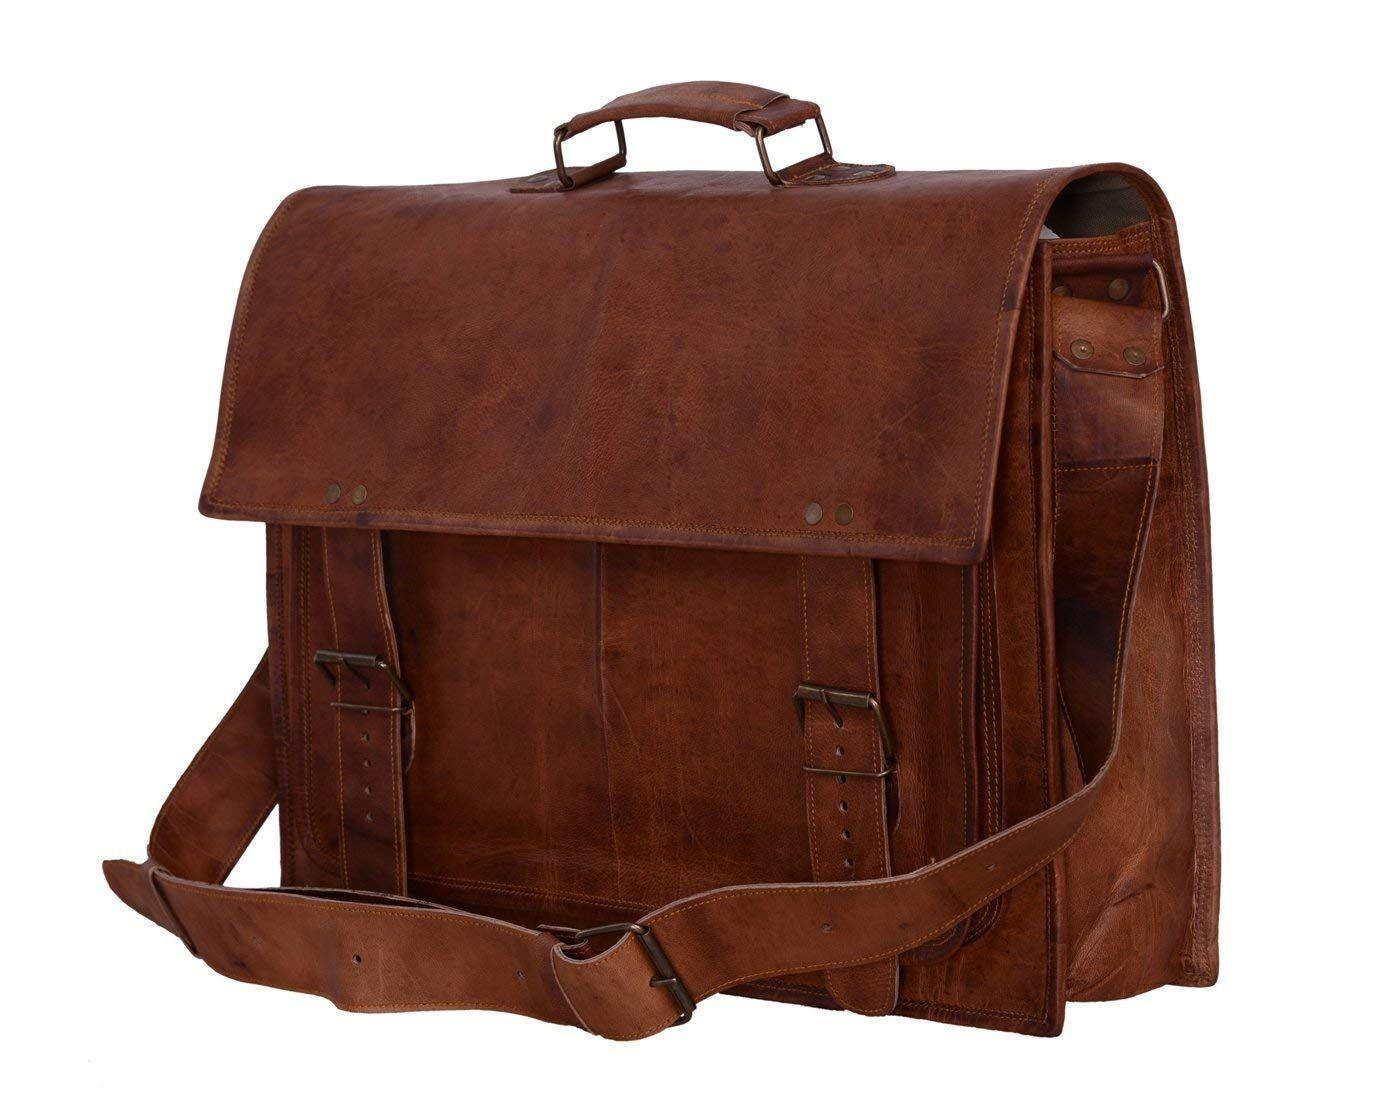 fde99cfa2048 Messenger #Bag Komal's Passion Leather 16